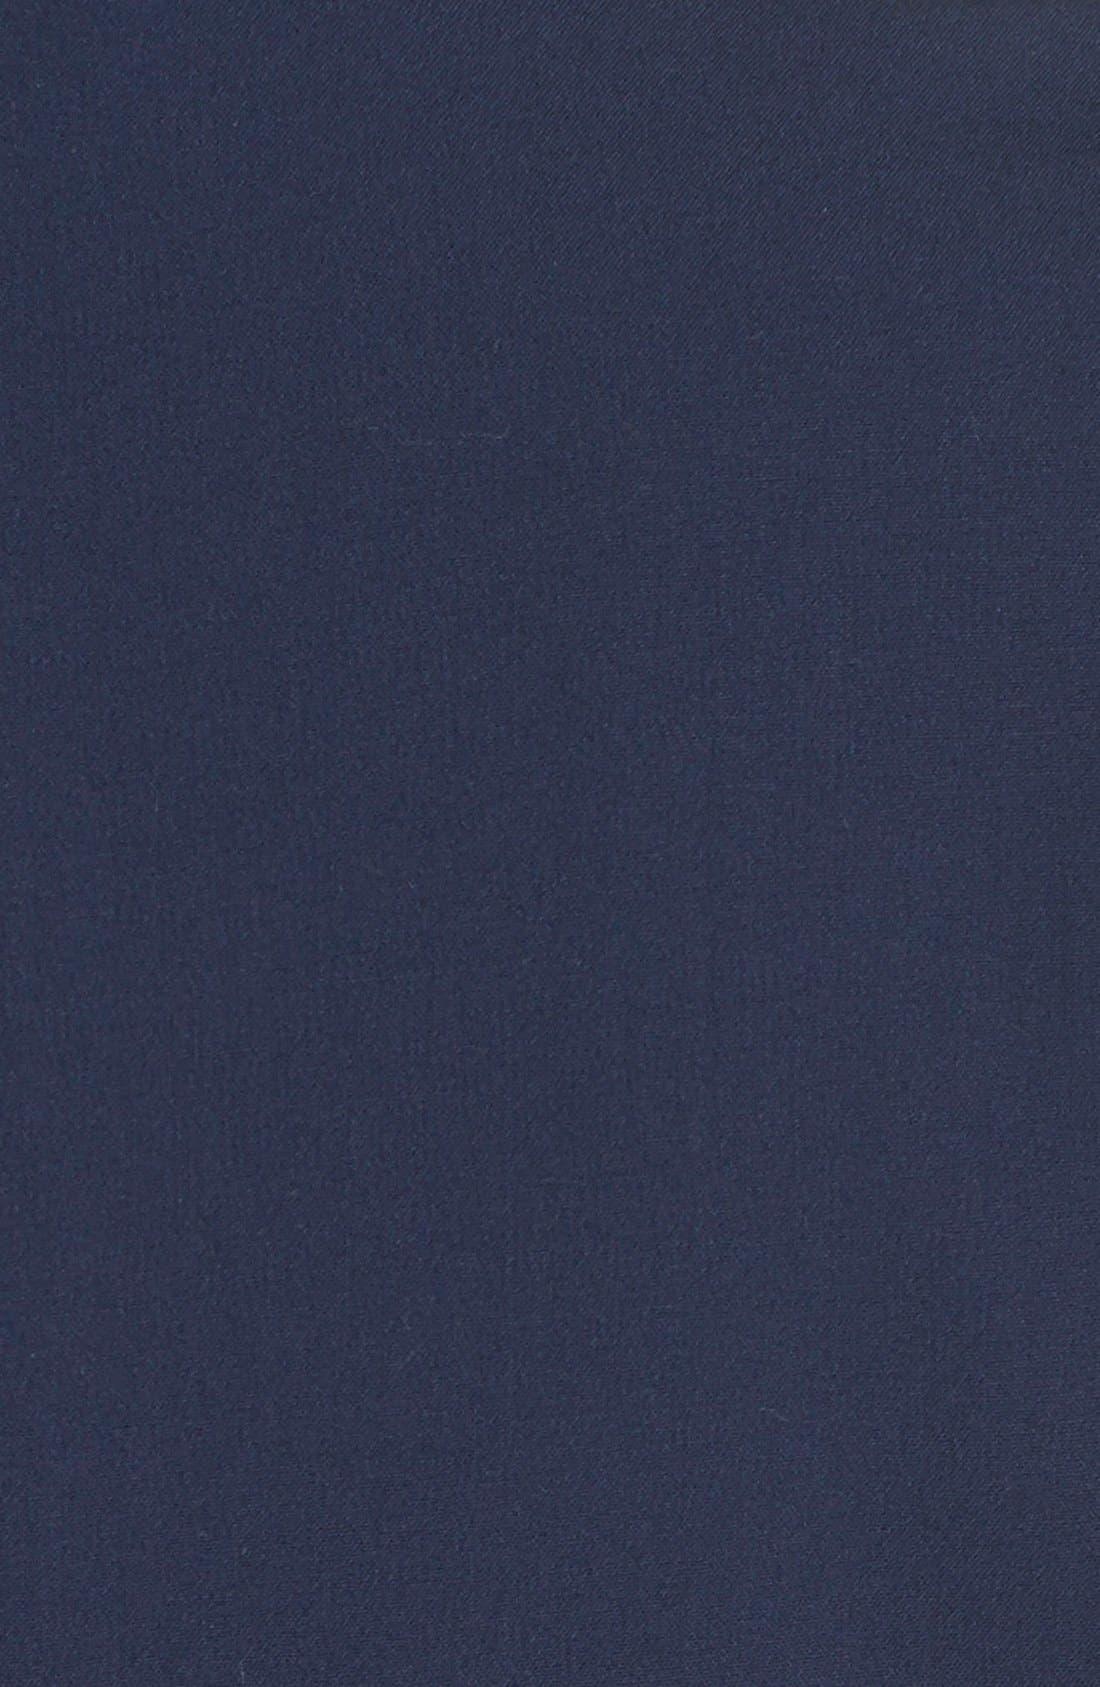 Sheath Dress,                             Alternate thumbnail 24, color,